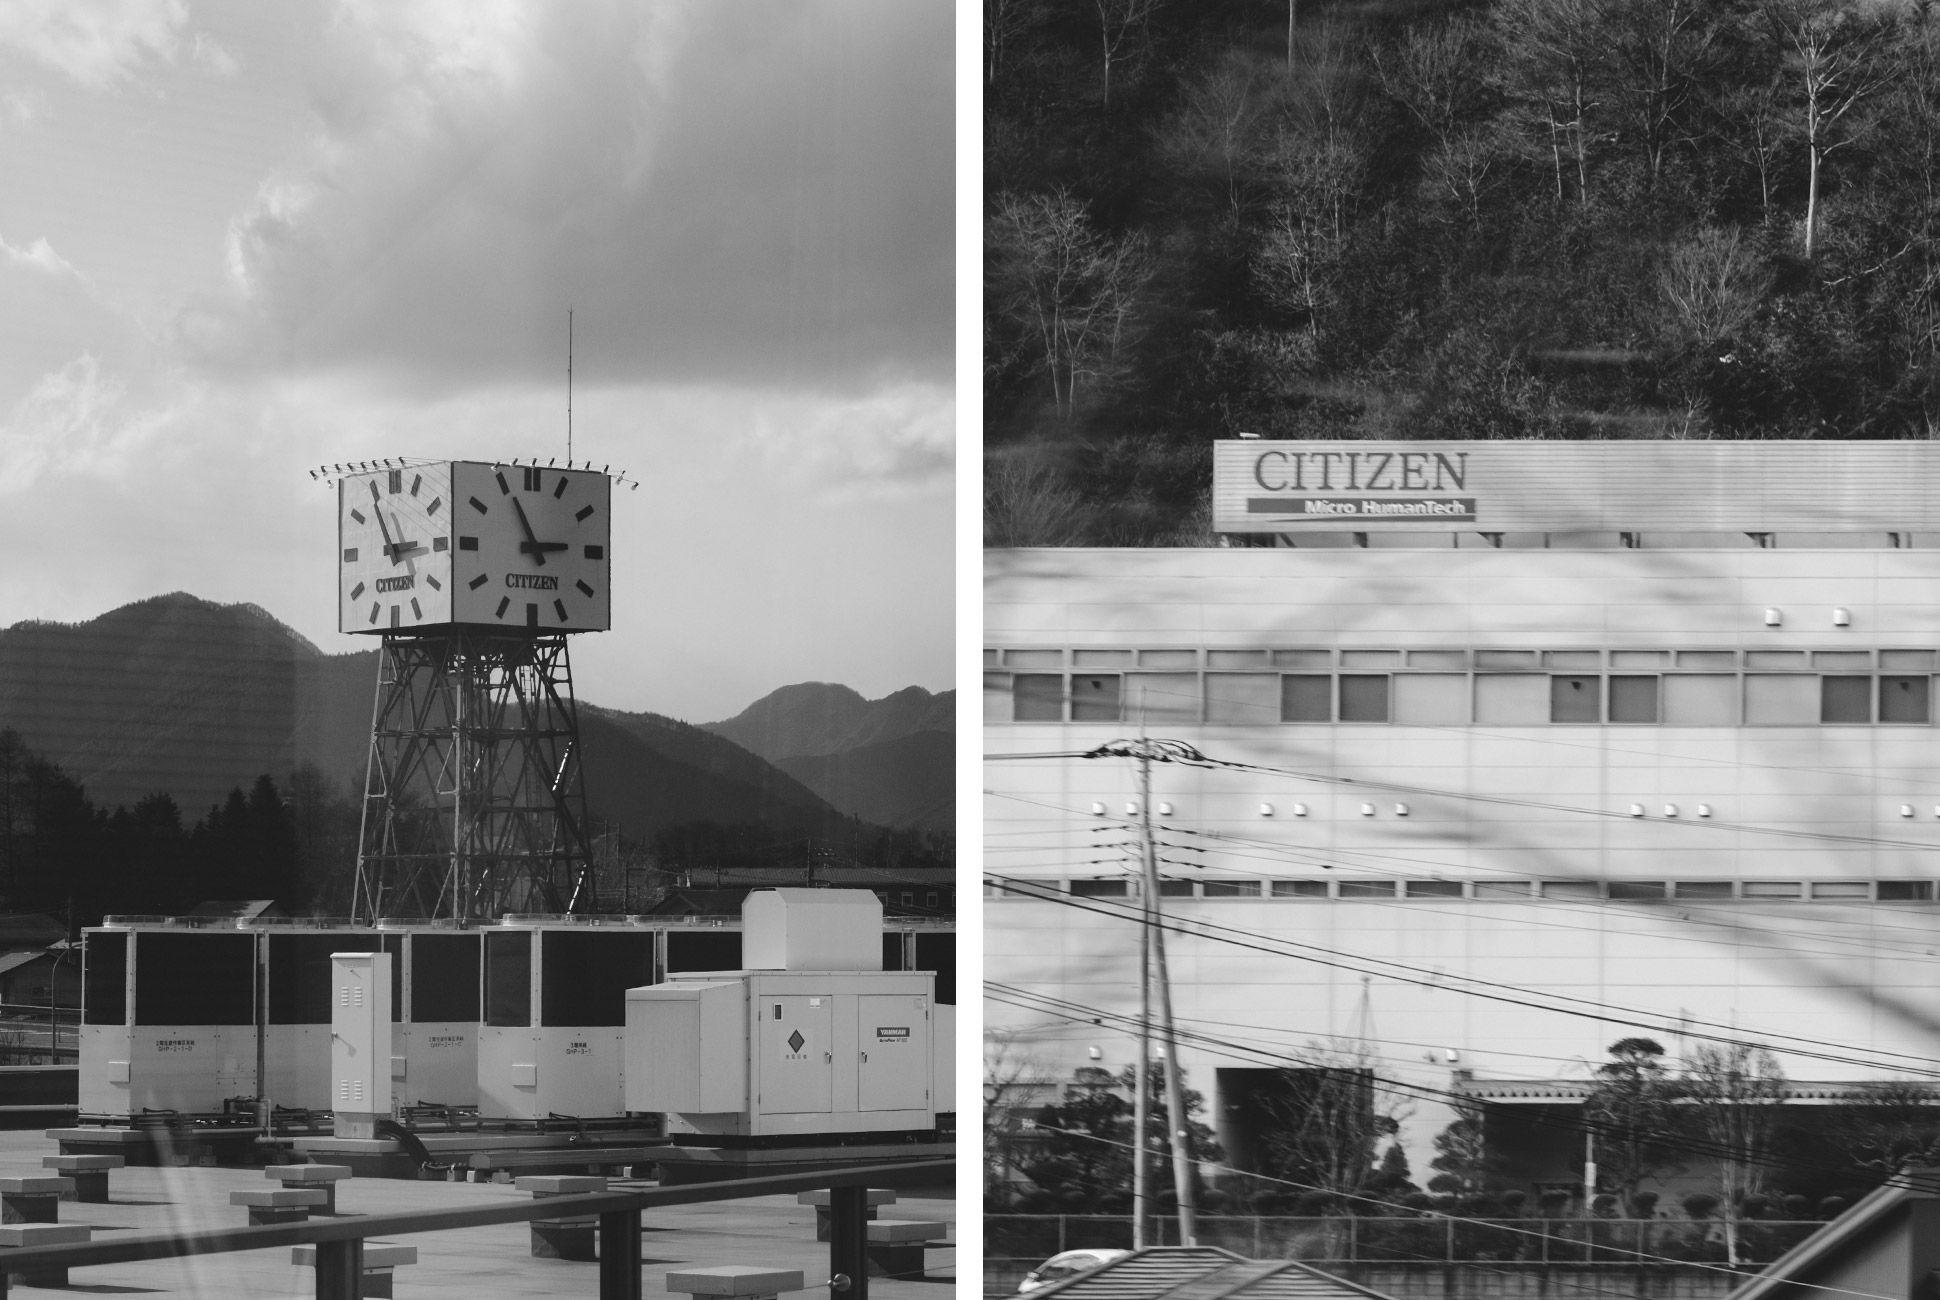 Citizen's watch factory near Mt. Fuji.